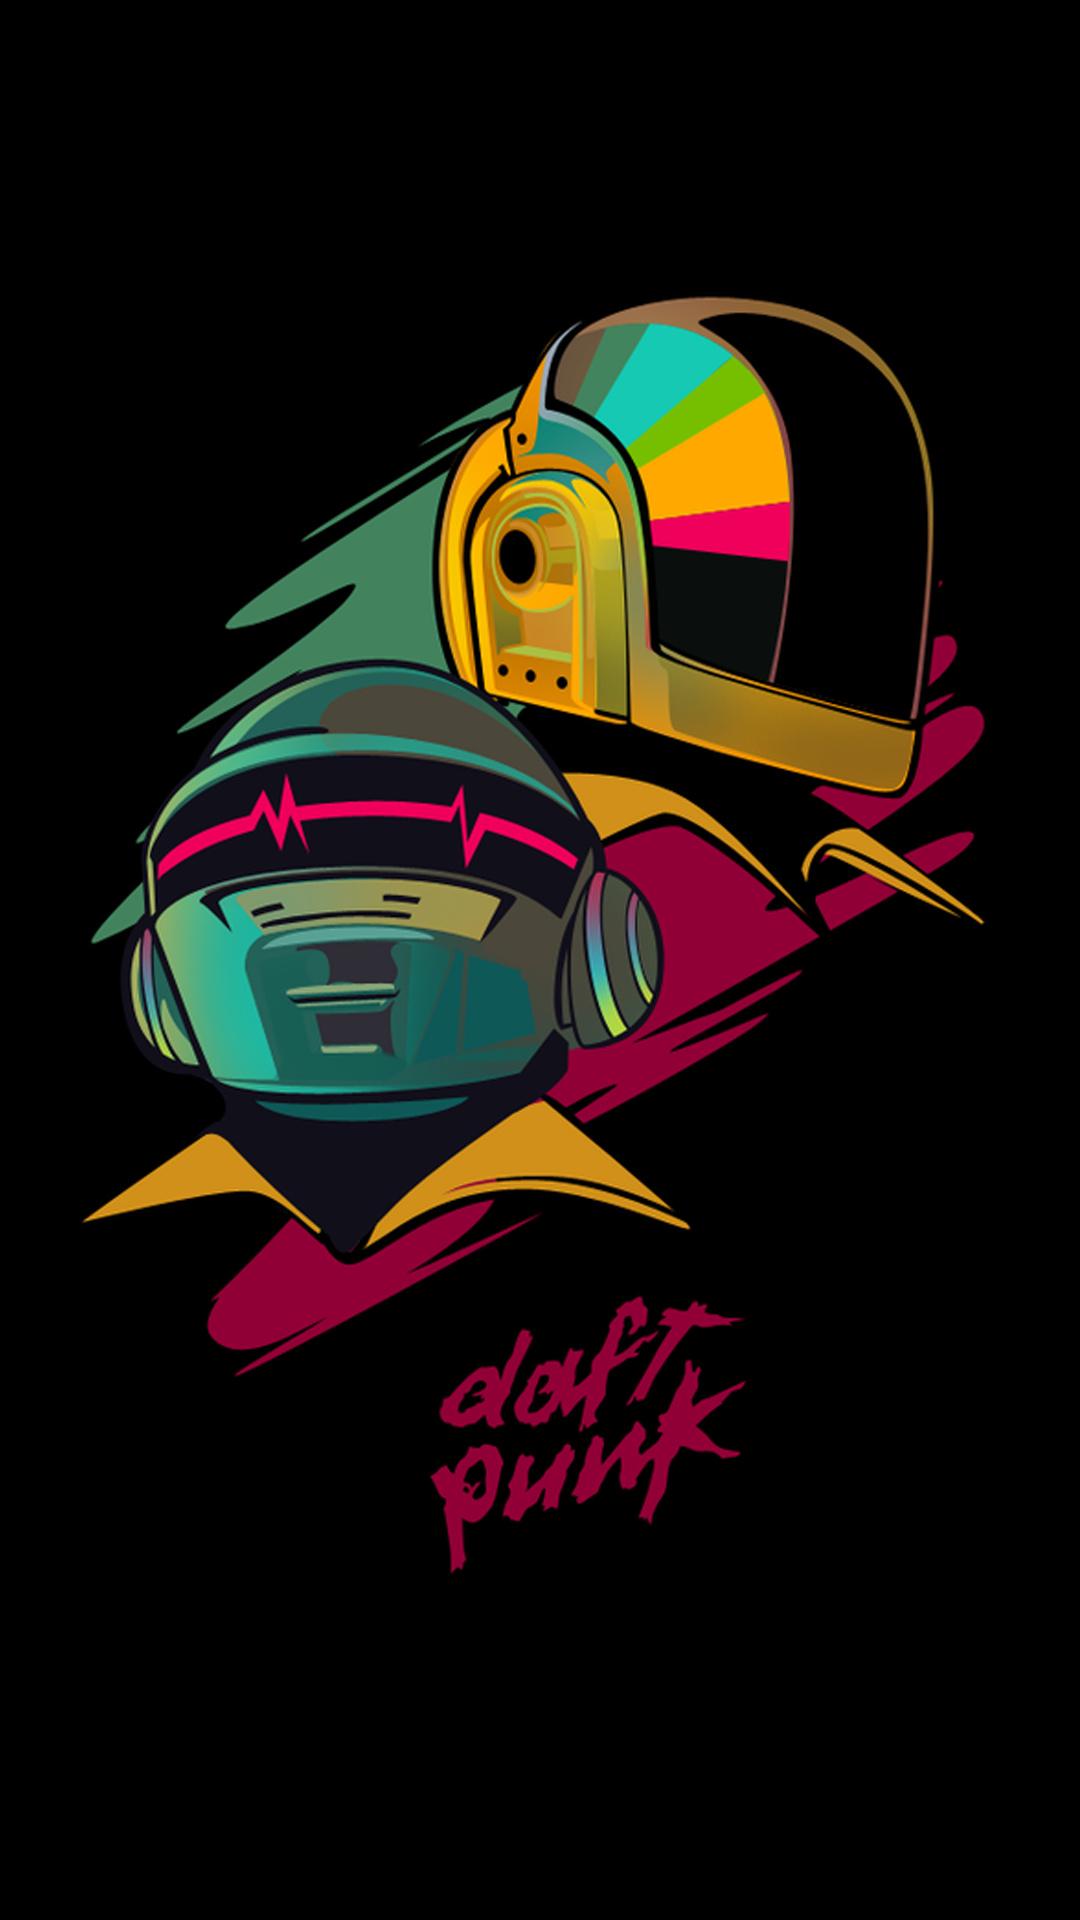 iPhone wallpaper daft punk colors Daft Punk